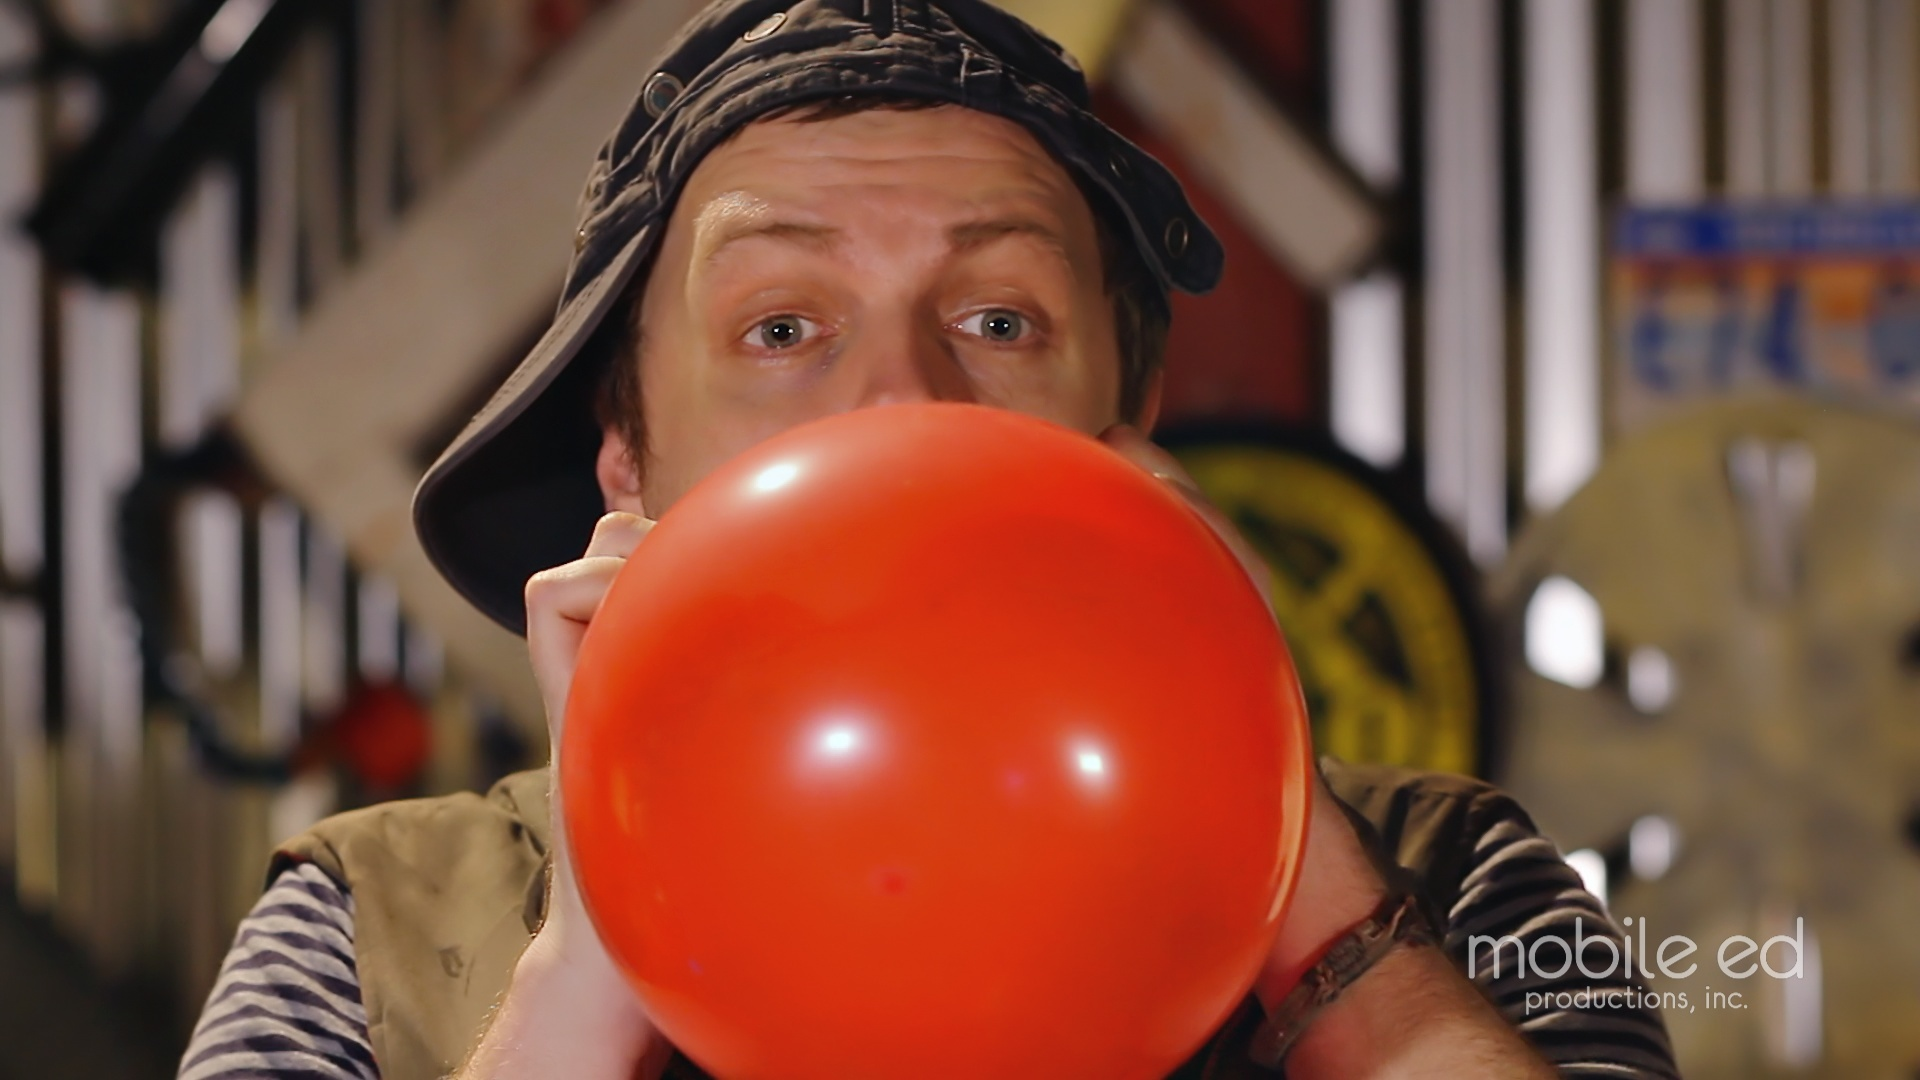 Make the Ball | Handy Dan the Junkyard Man | Mobile Ed Productions